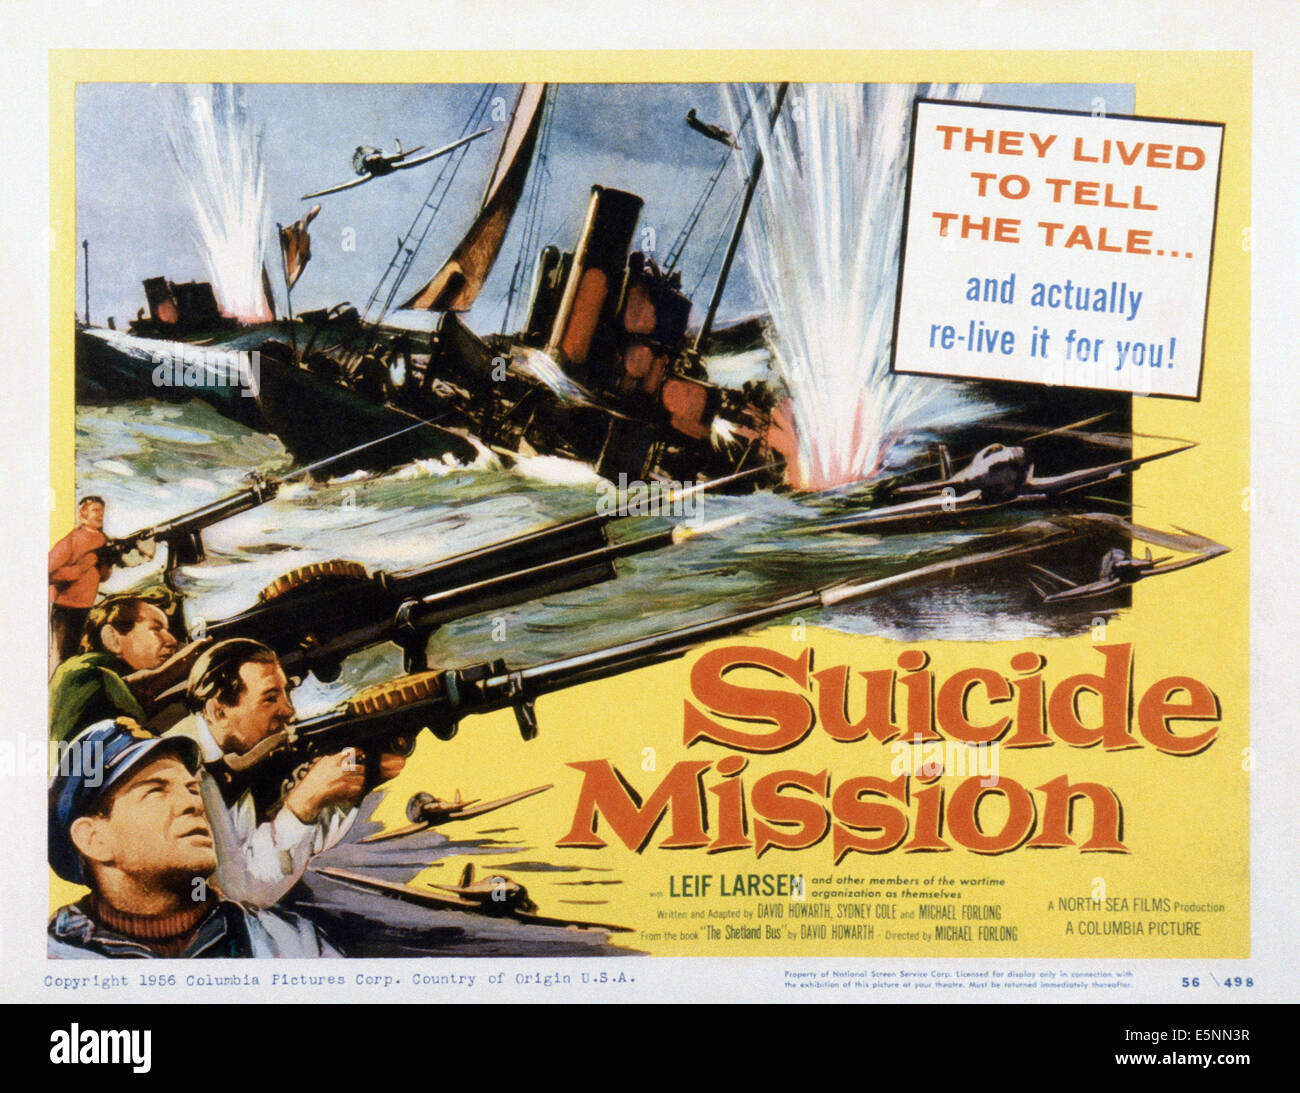 http://c8.alamy.com/comp/E5NN3R/shetlandsgjengen-aka-suicide-mission-us-lobbycard-1954-us-release-E5NN3R.jpg